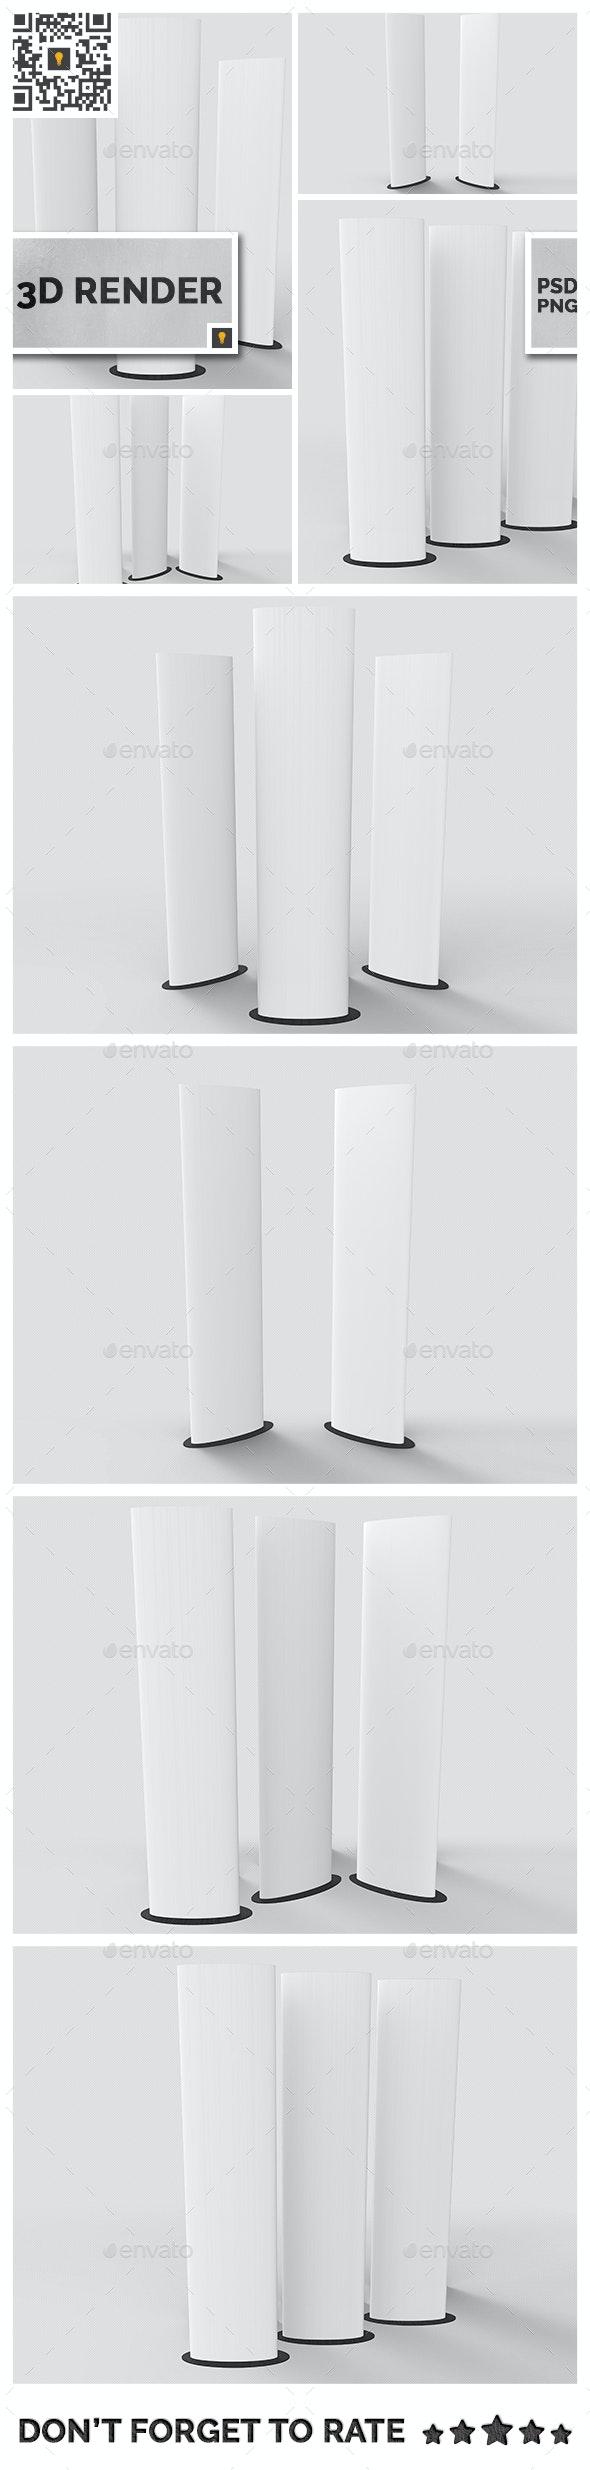 Elliptical Totem Display 3D Render - Objects 3D Renders